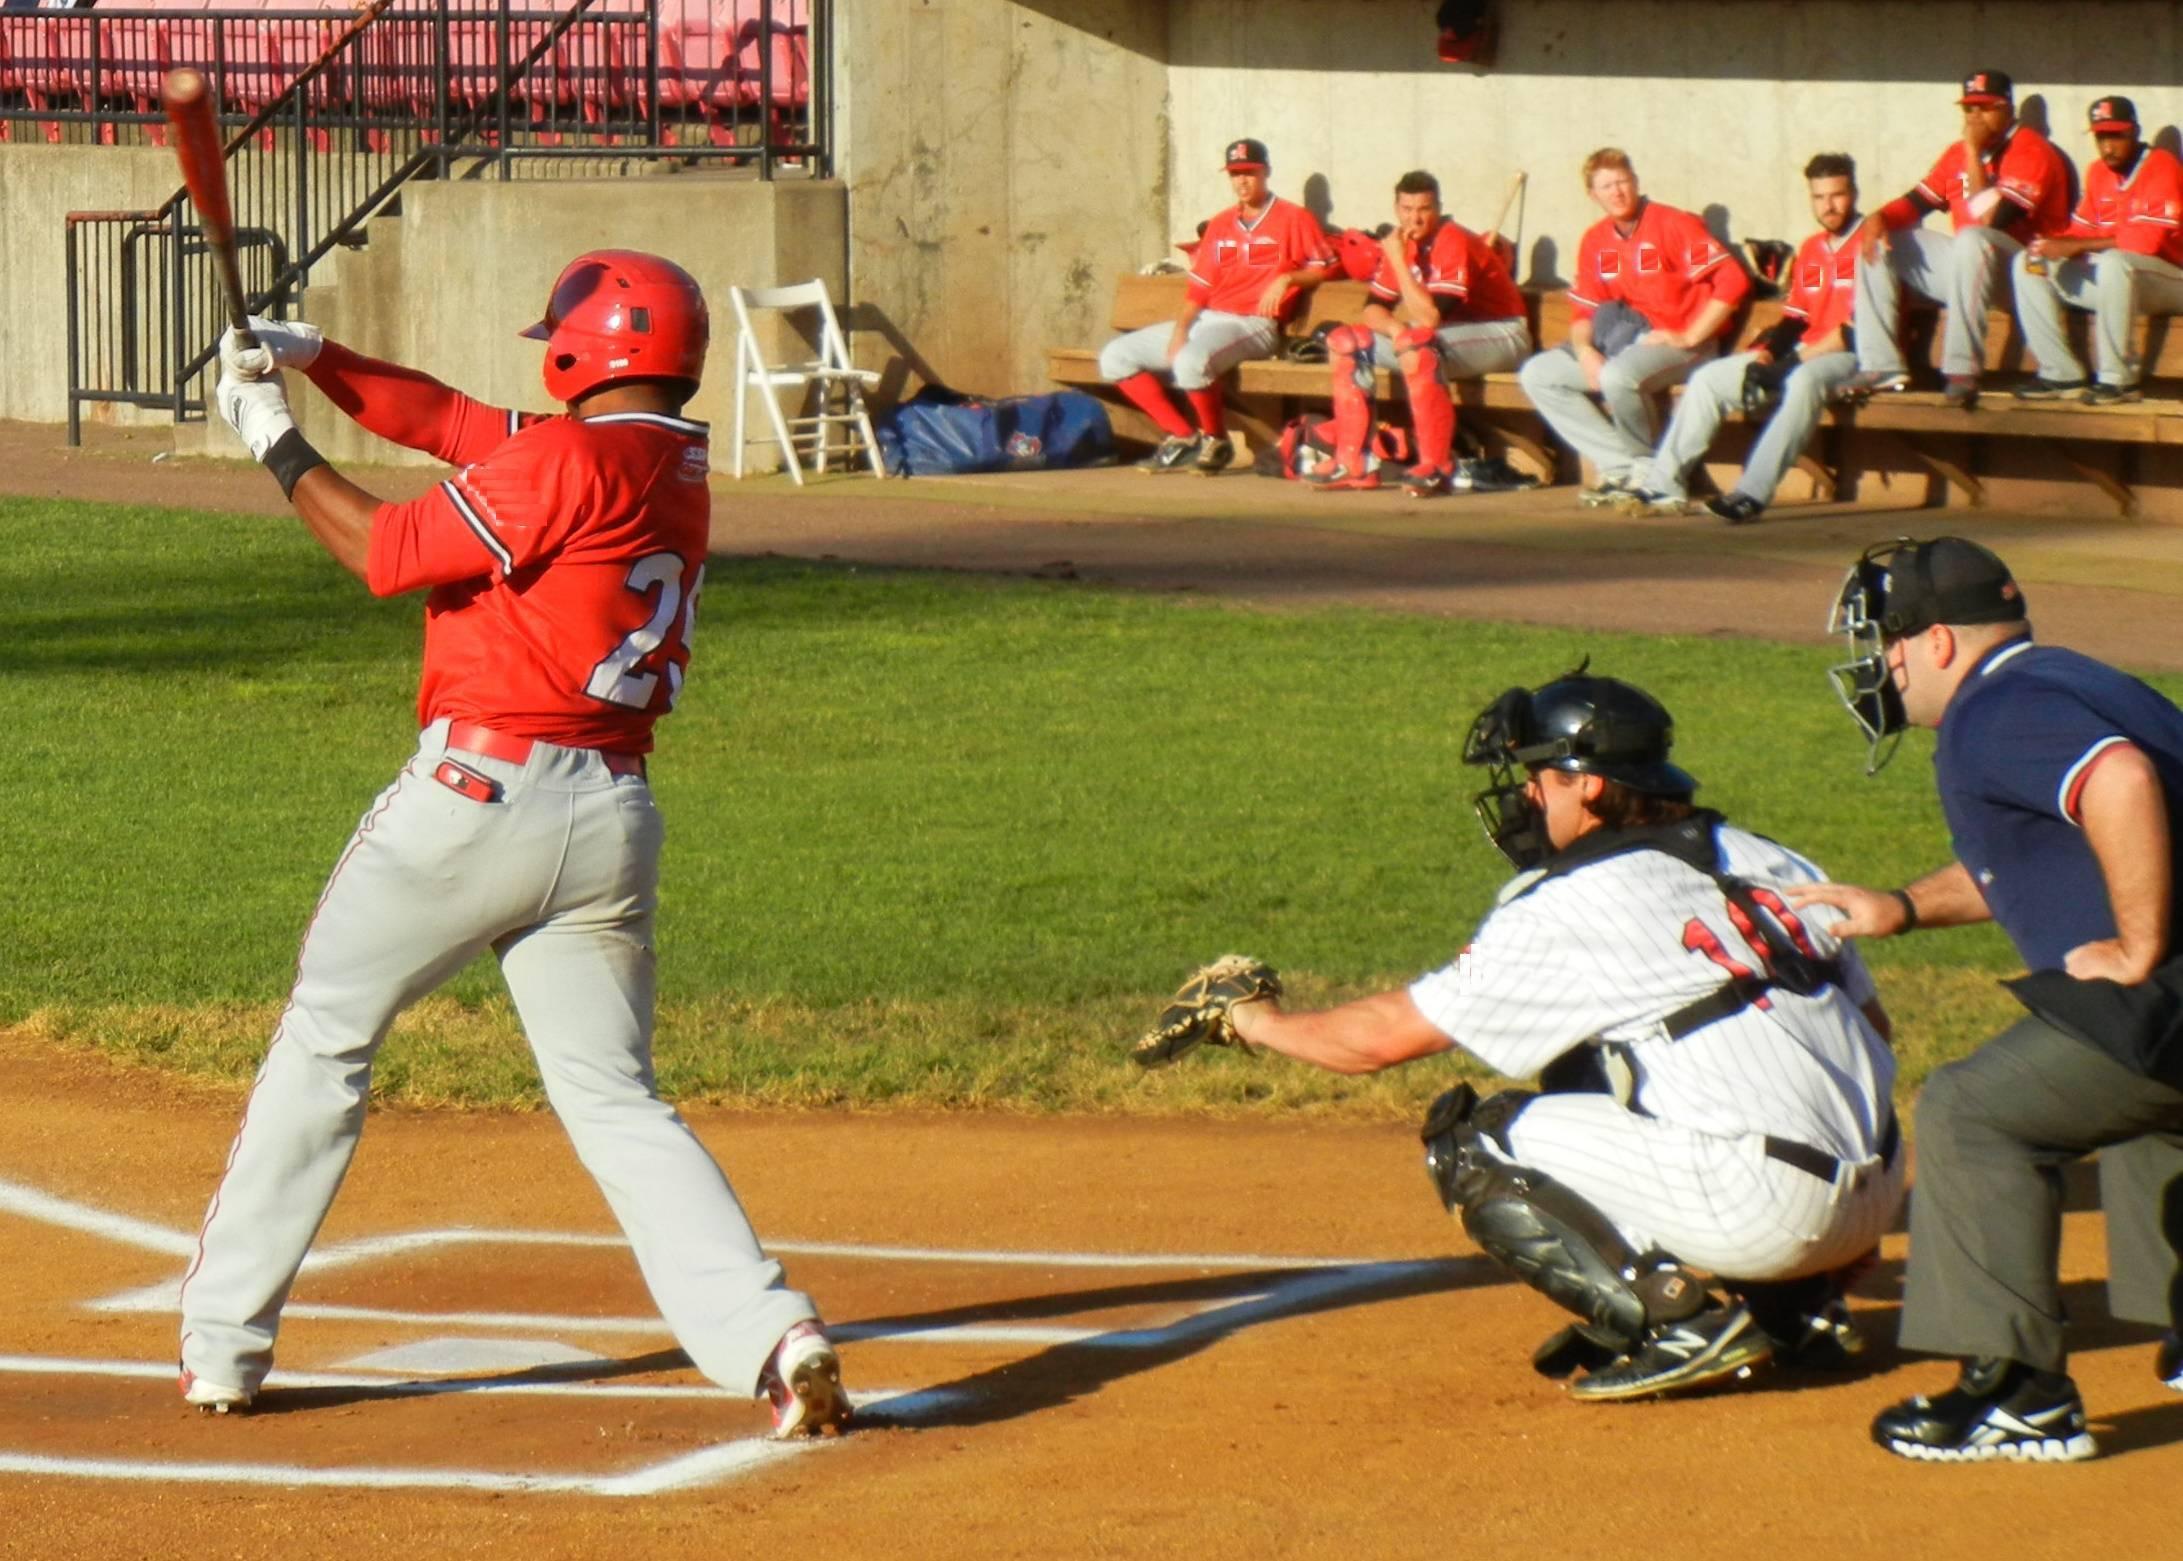 cf09e6926f3003903914_baseball.jpg